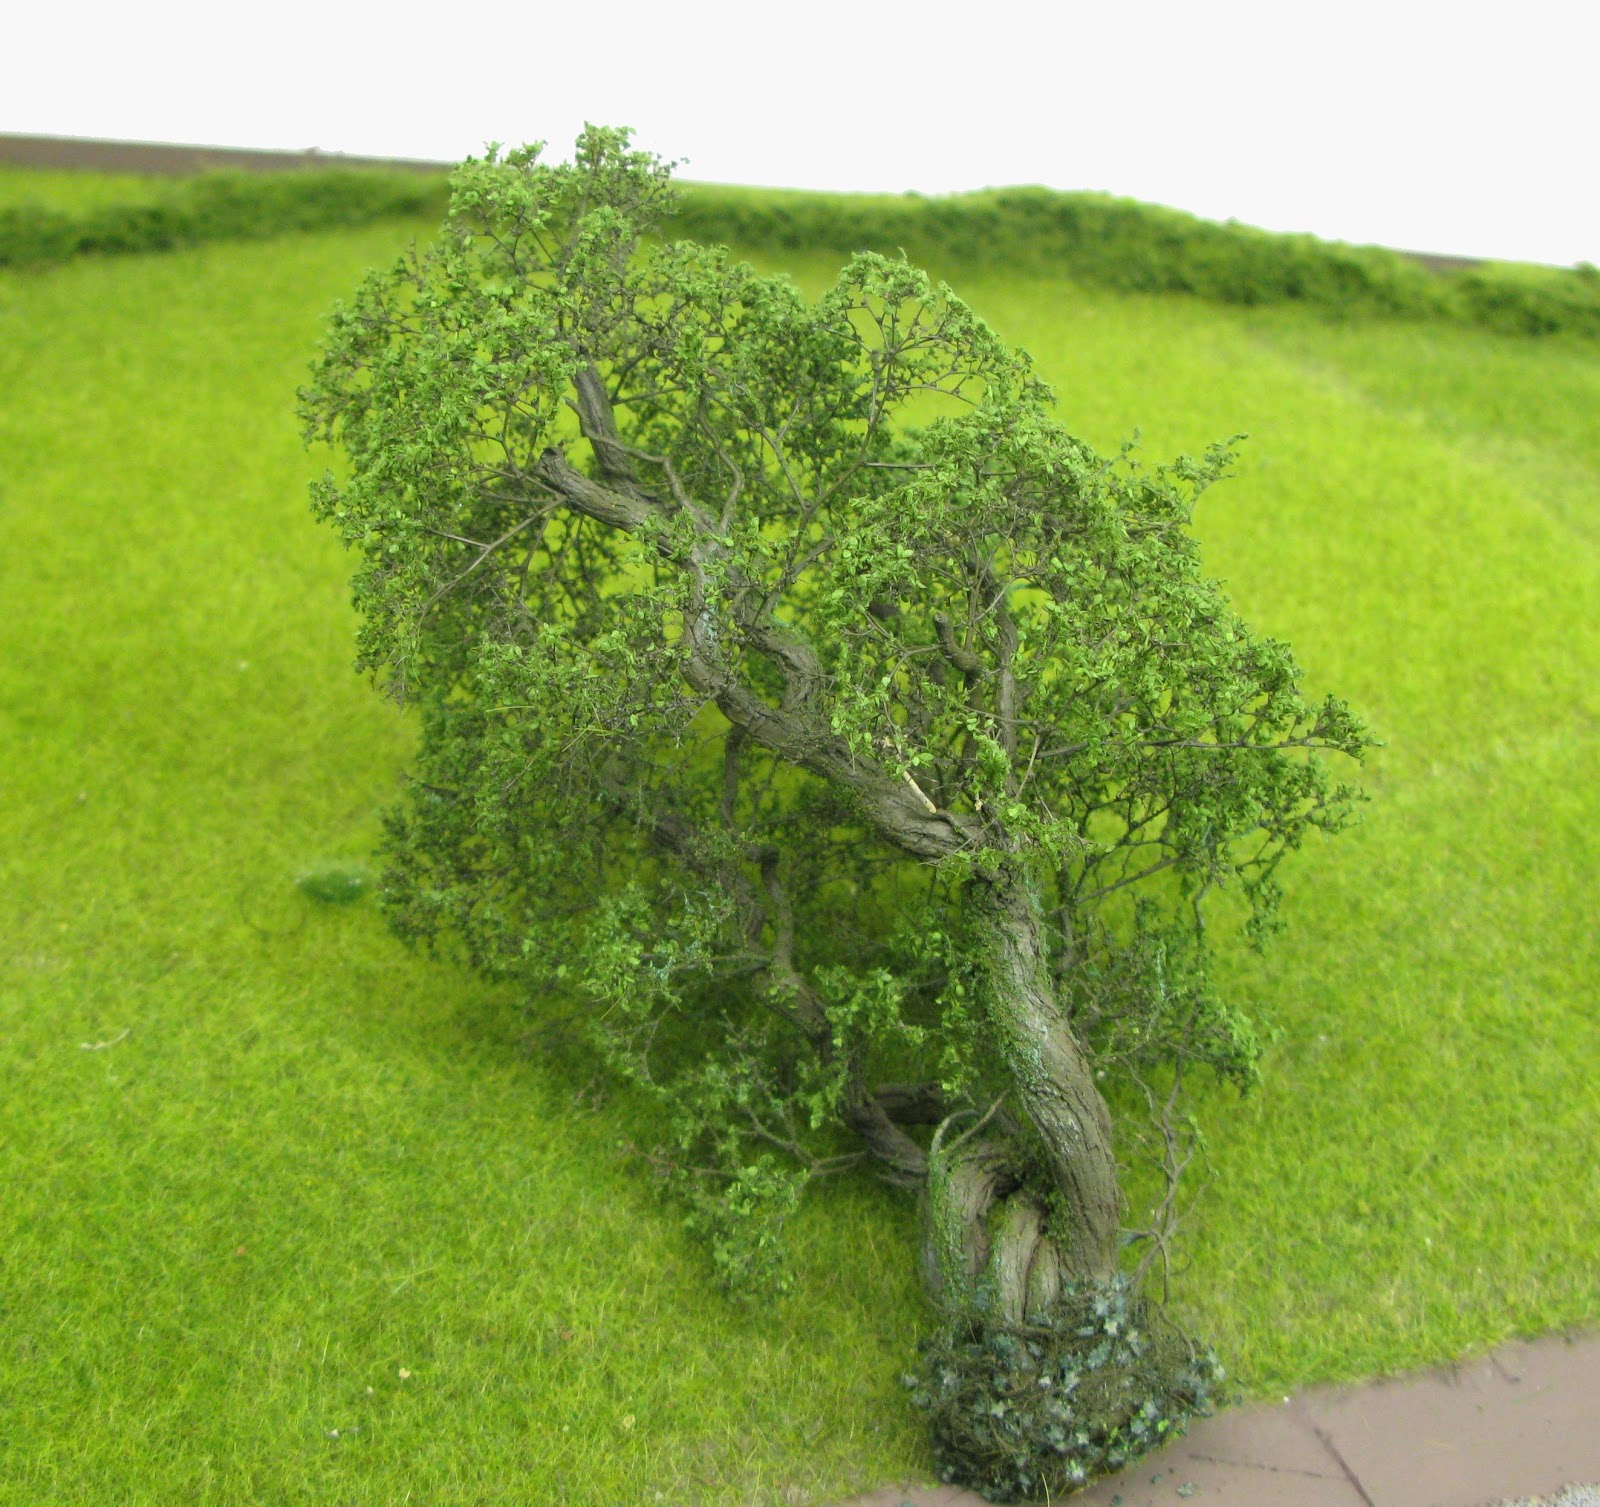 The_tree2.jpg